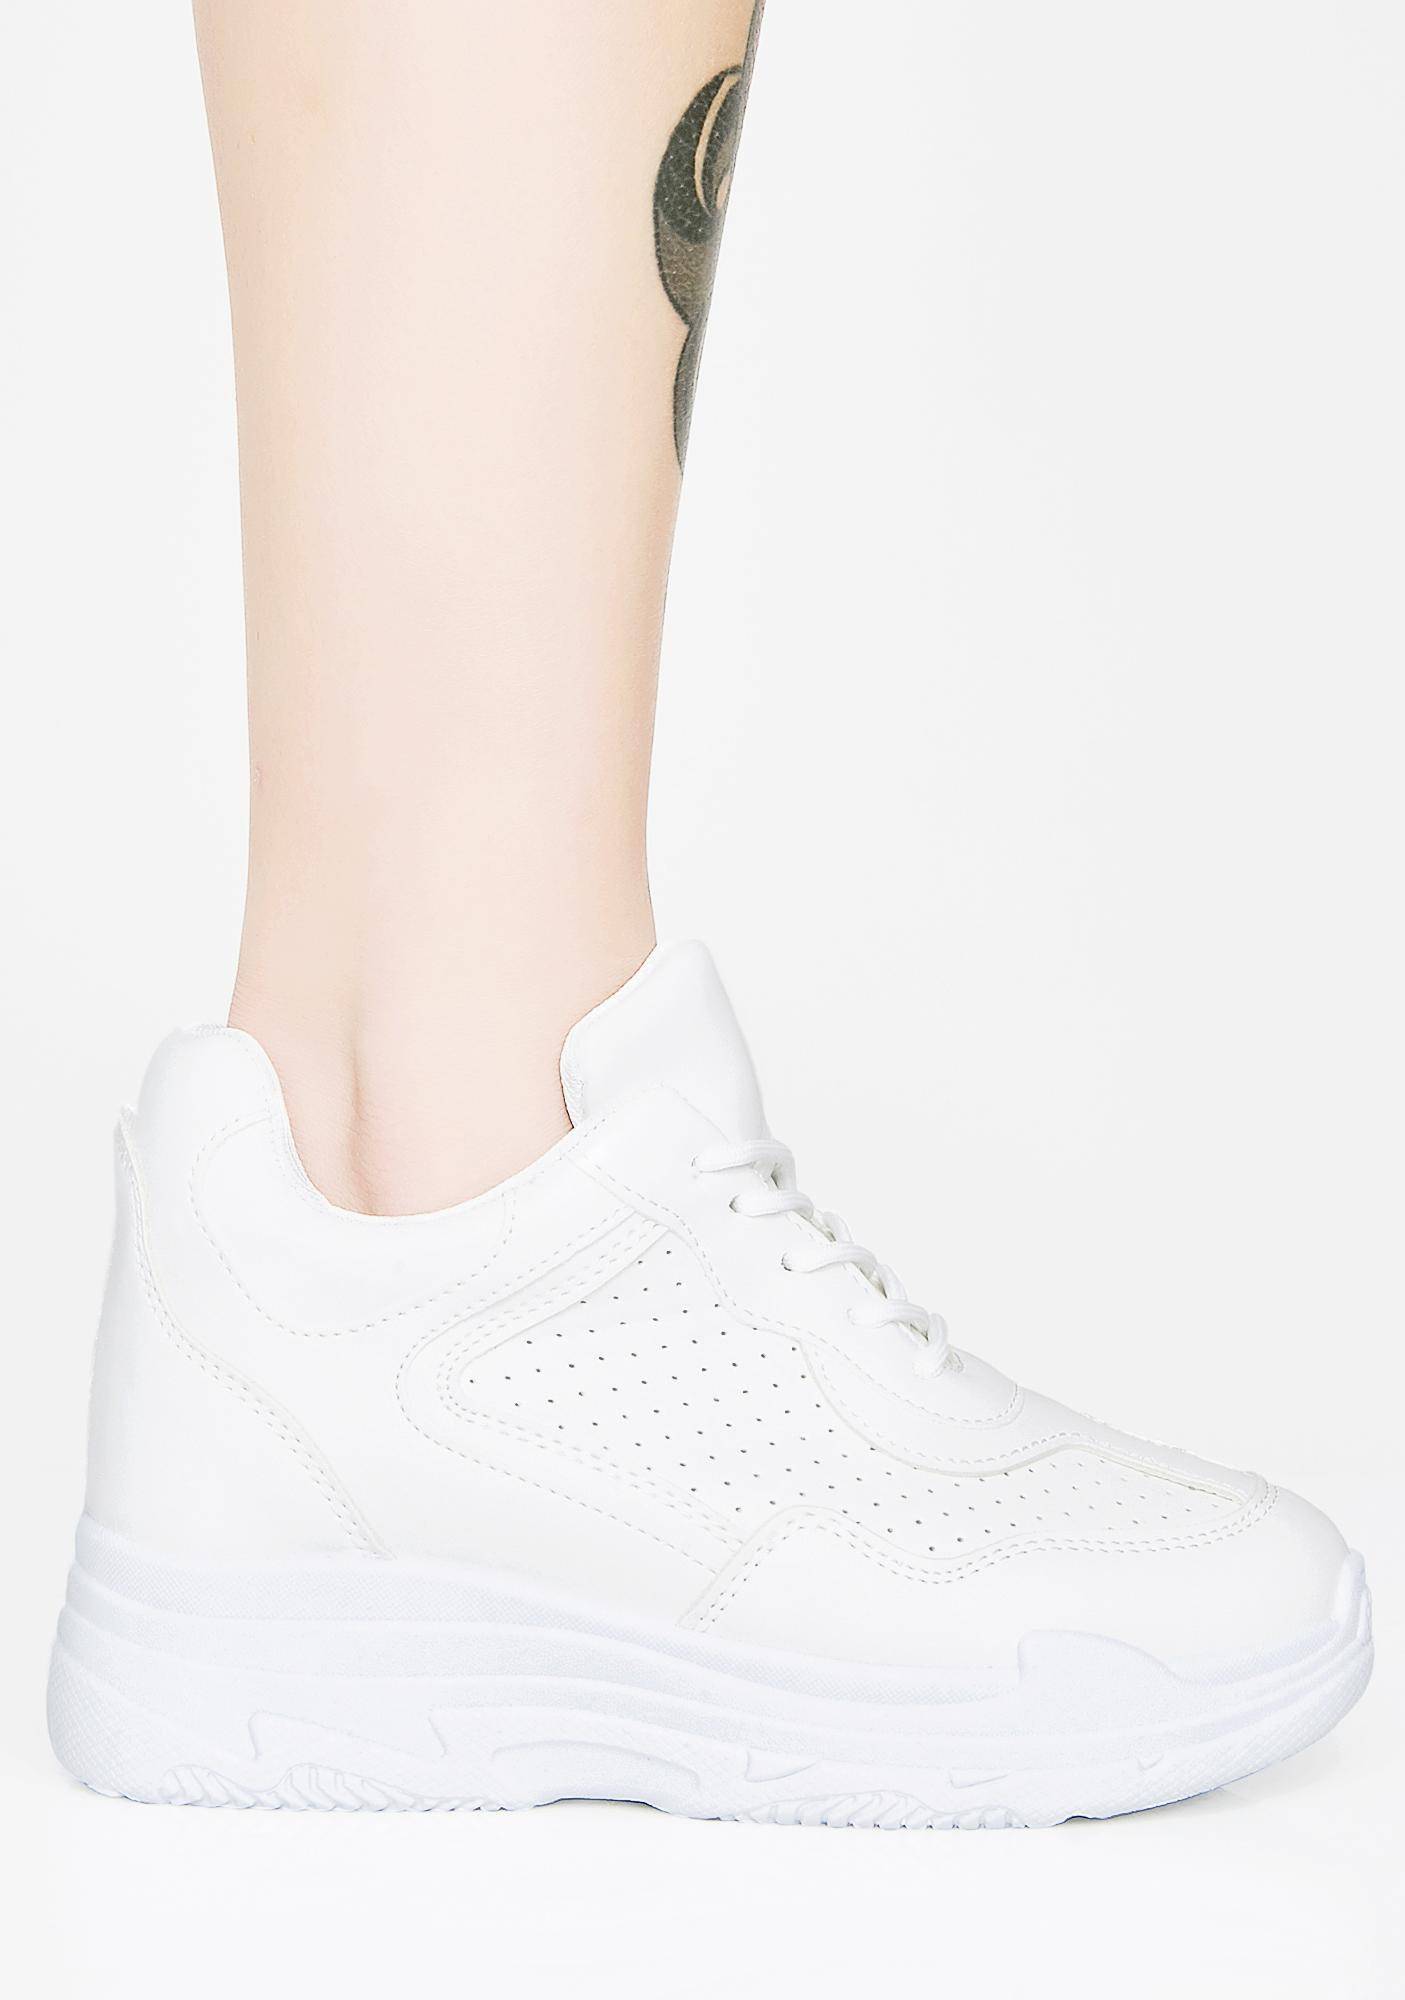 Romp Around Platform Sneakers